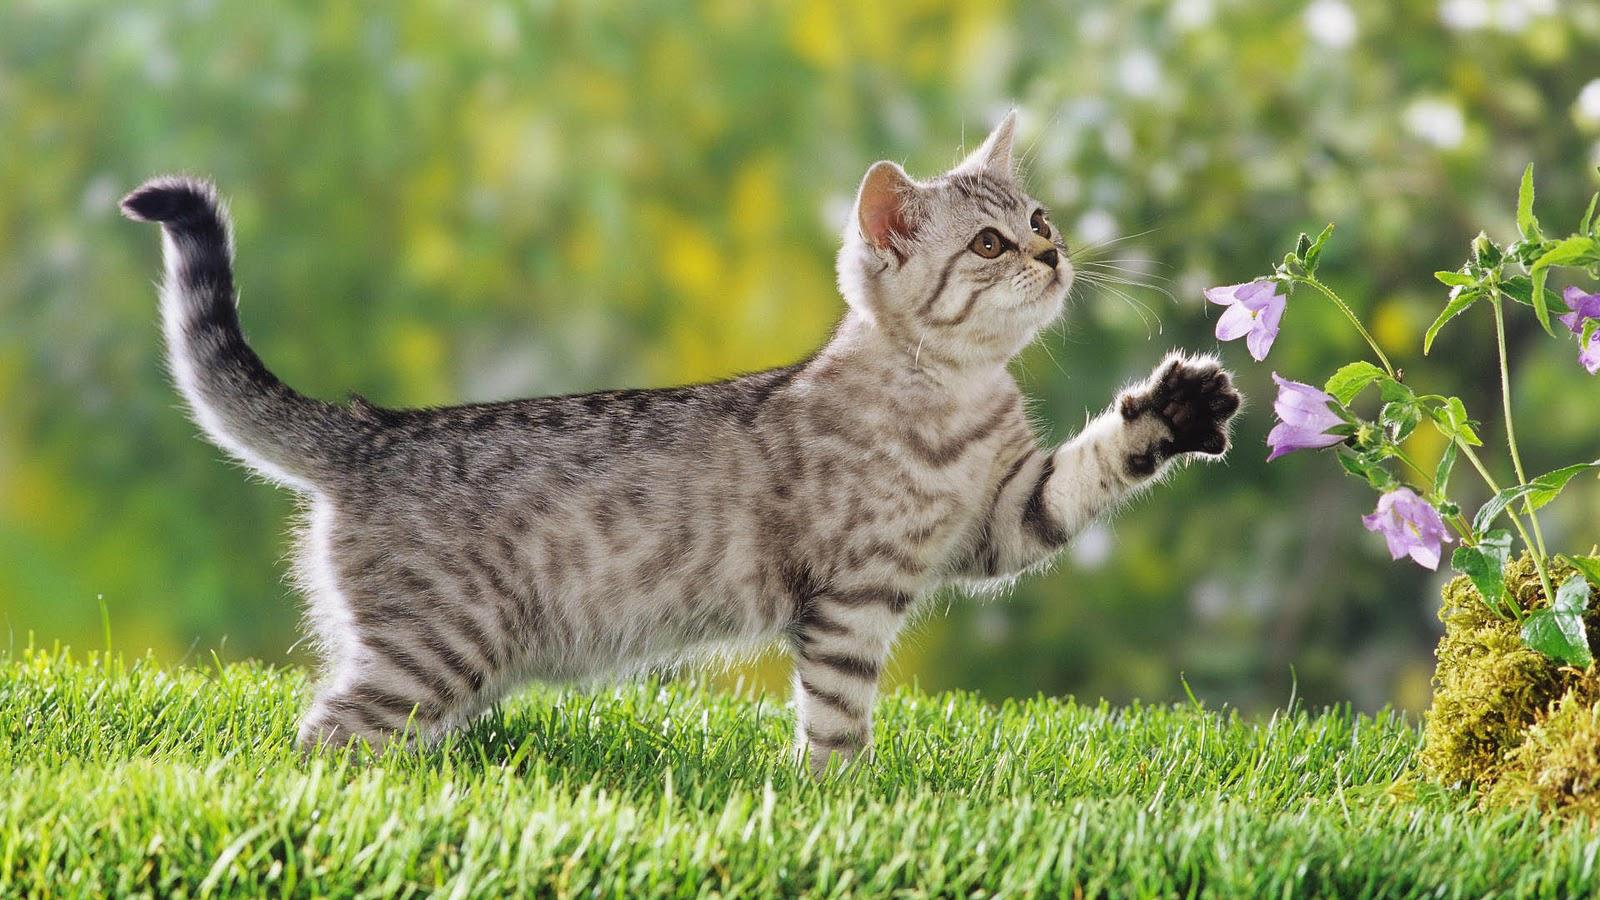 Kitten achtergronden jonge katjes hd kittens wallpapers foto 1jpg 1600x900